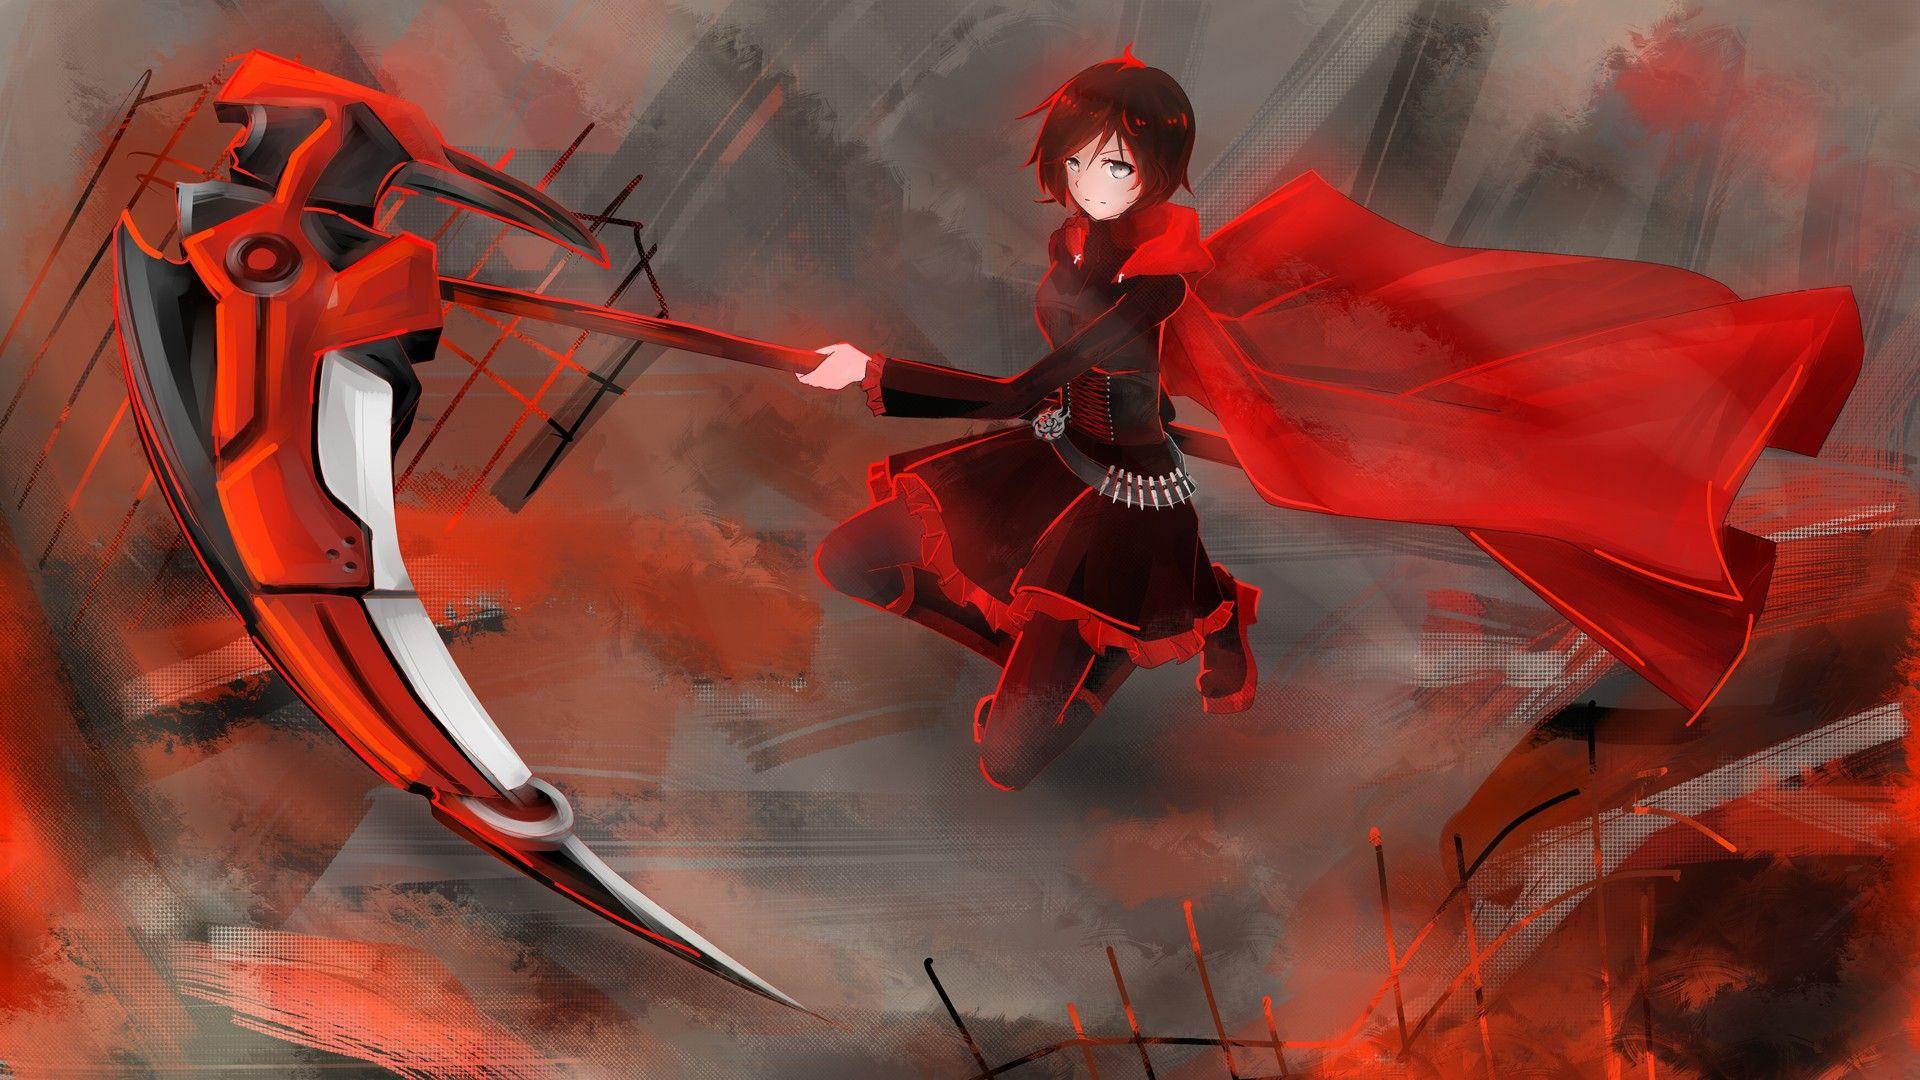 Rwby Wallpaper Ruby Rose Rwby Rwby Wallpaper Rwby Anime